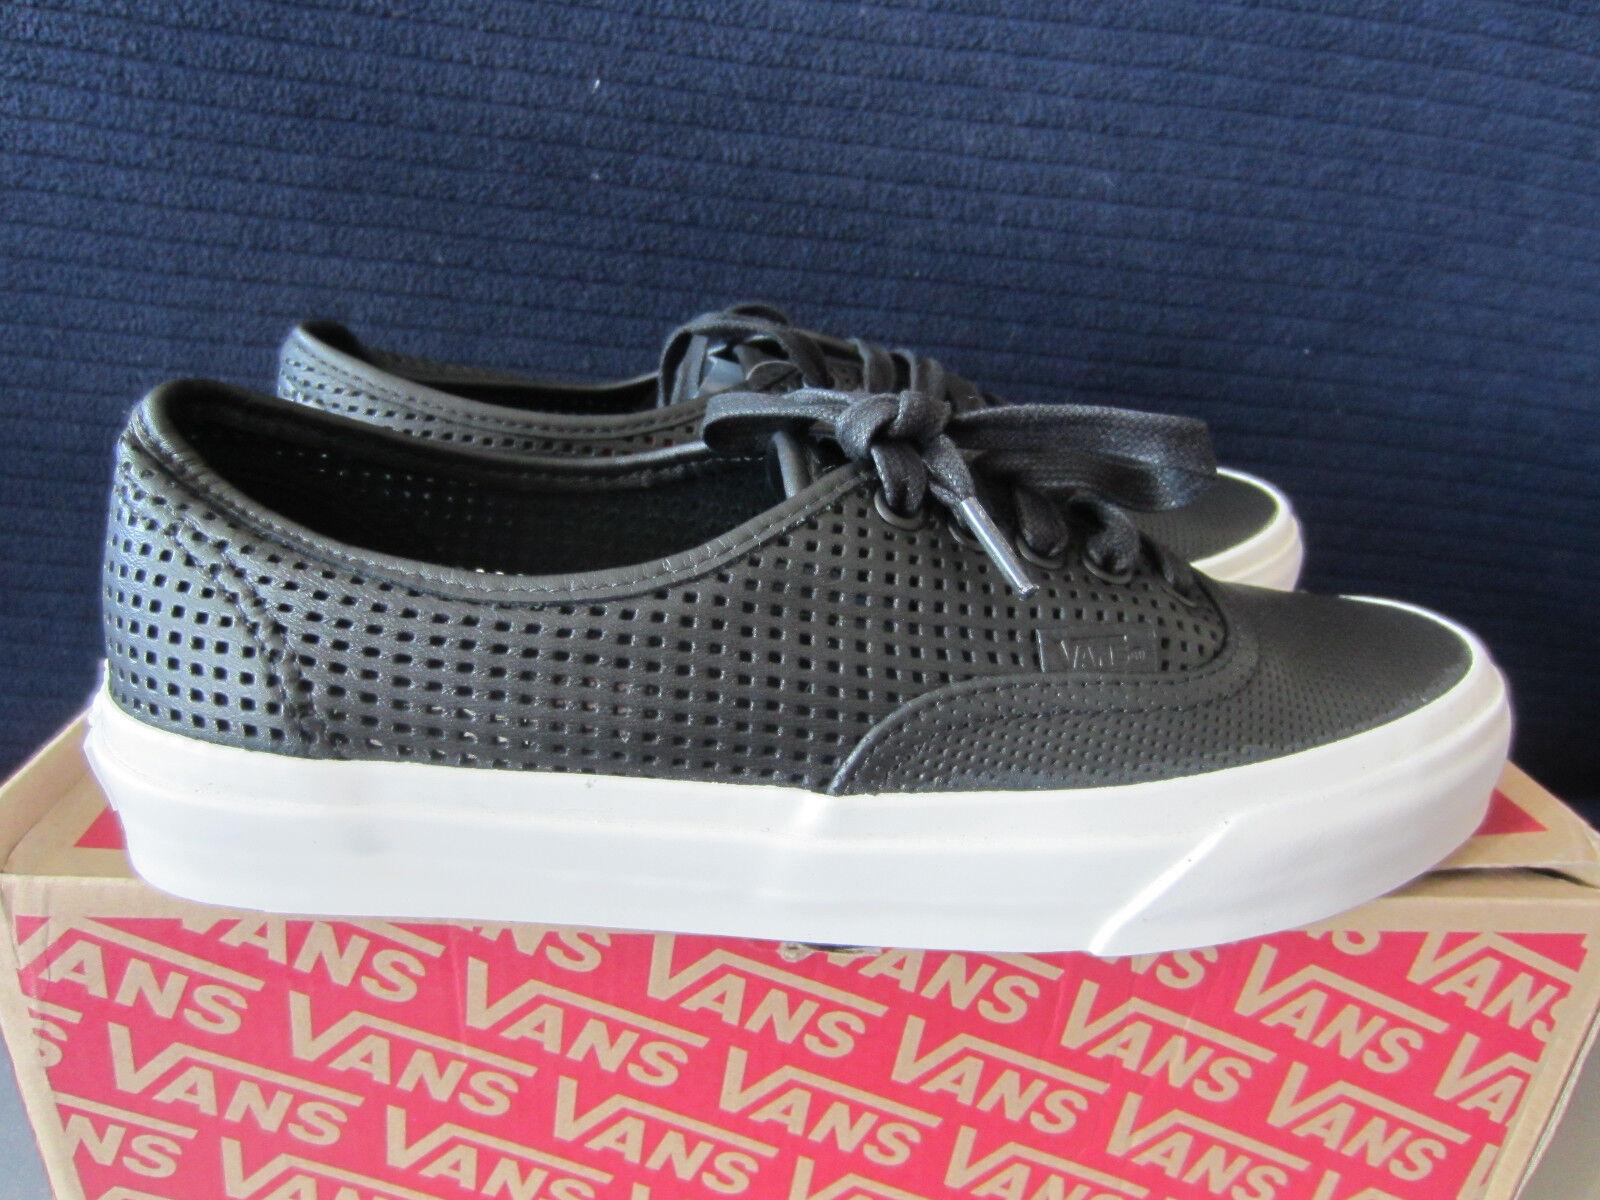 VANS Authentic DX Damen Sneakers Schwarz Gr. 40, 42. Neu und OVP